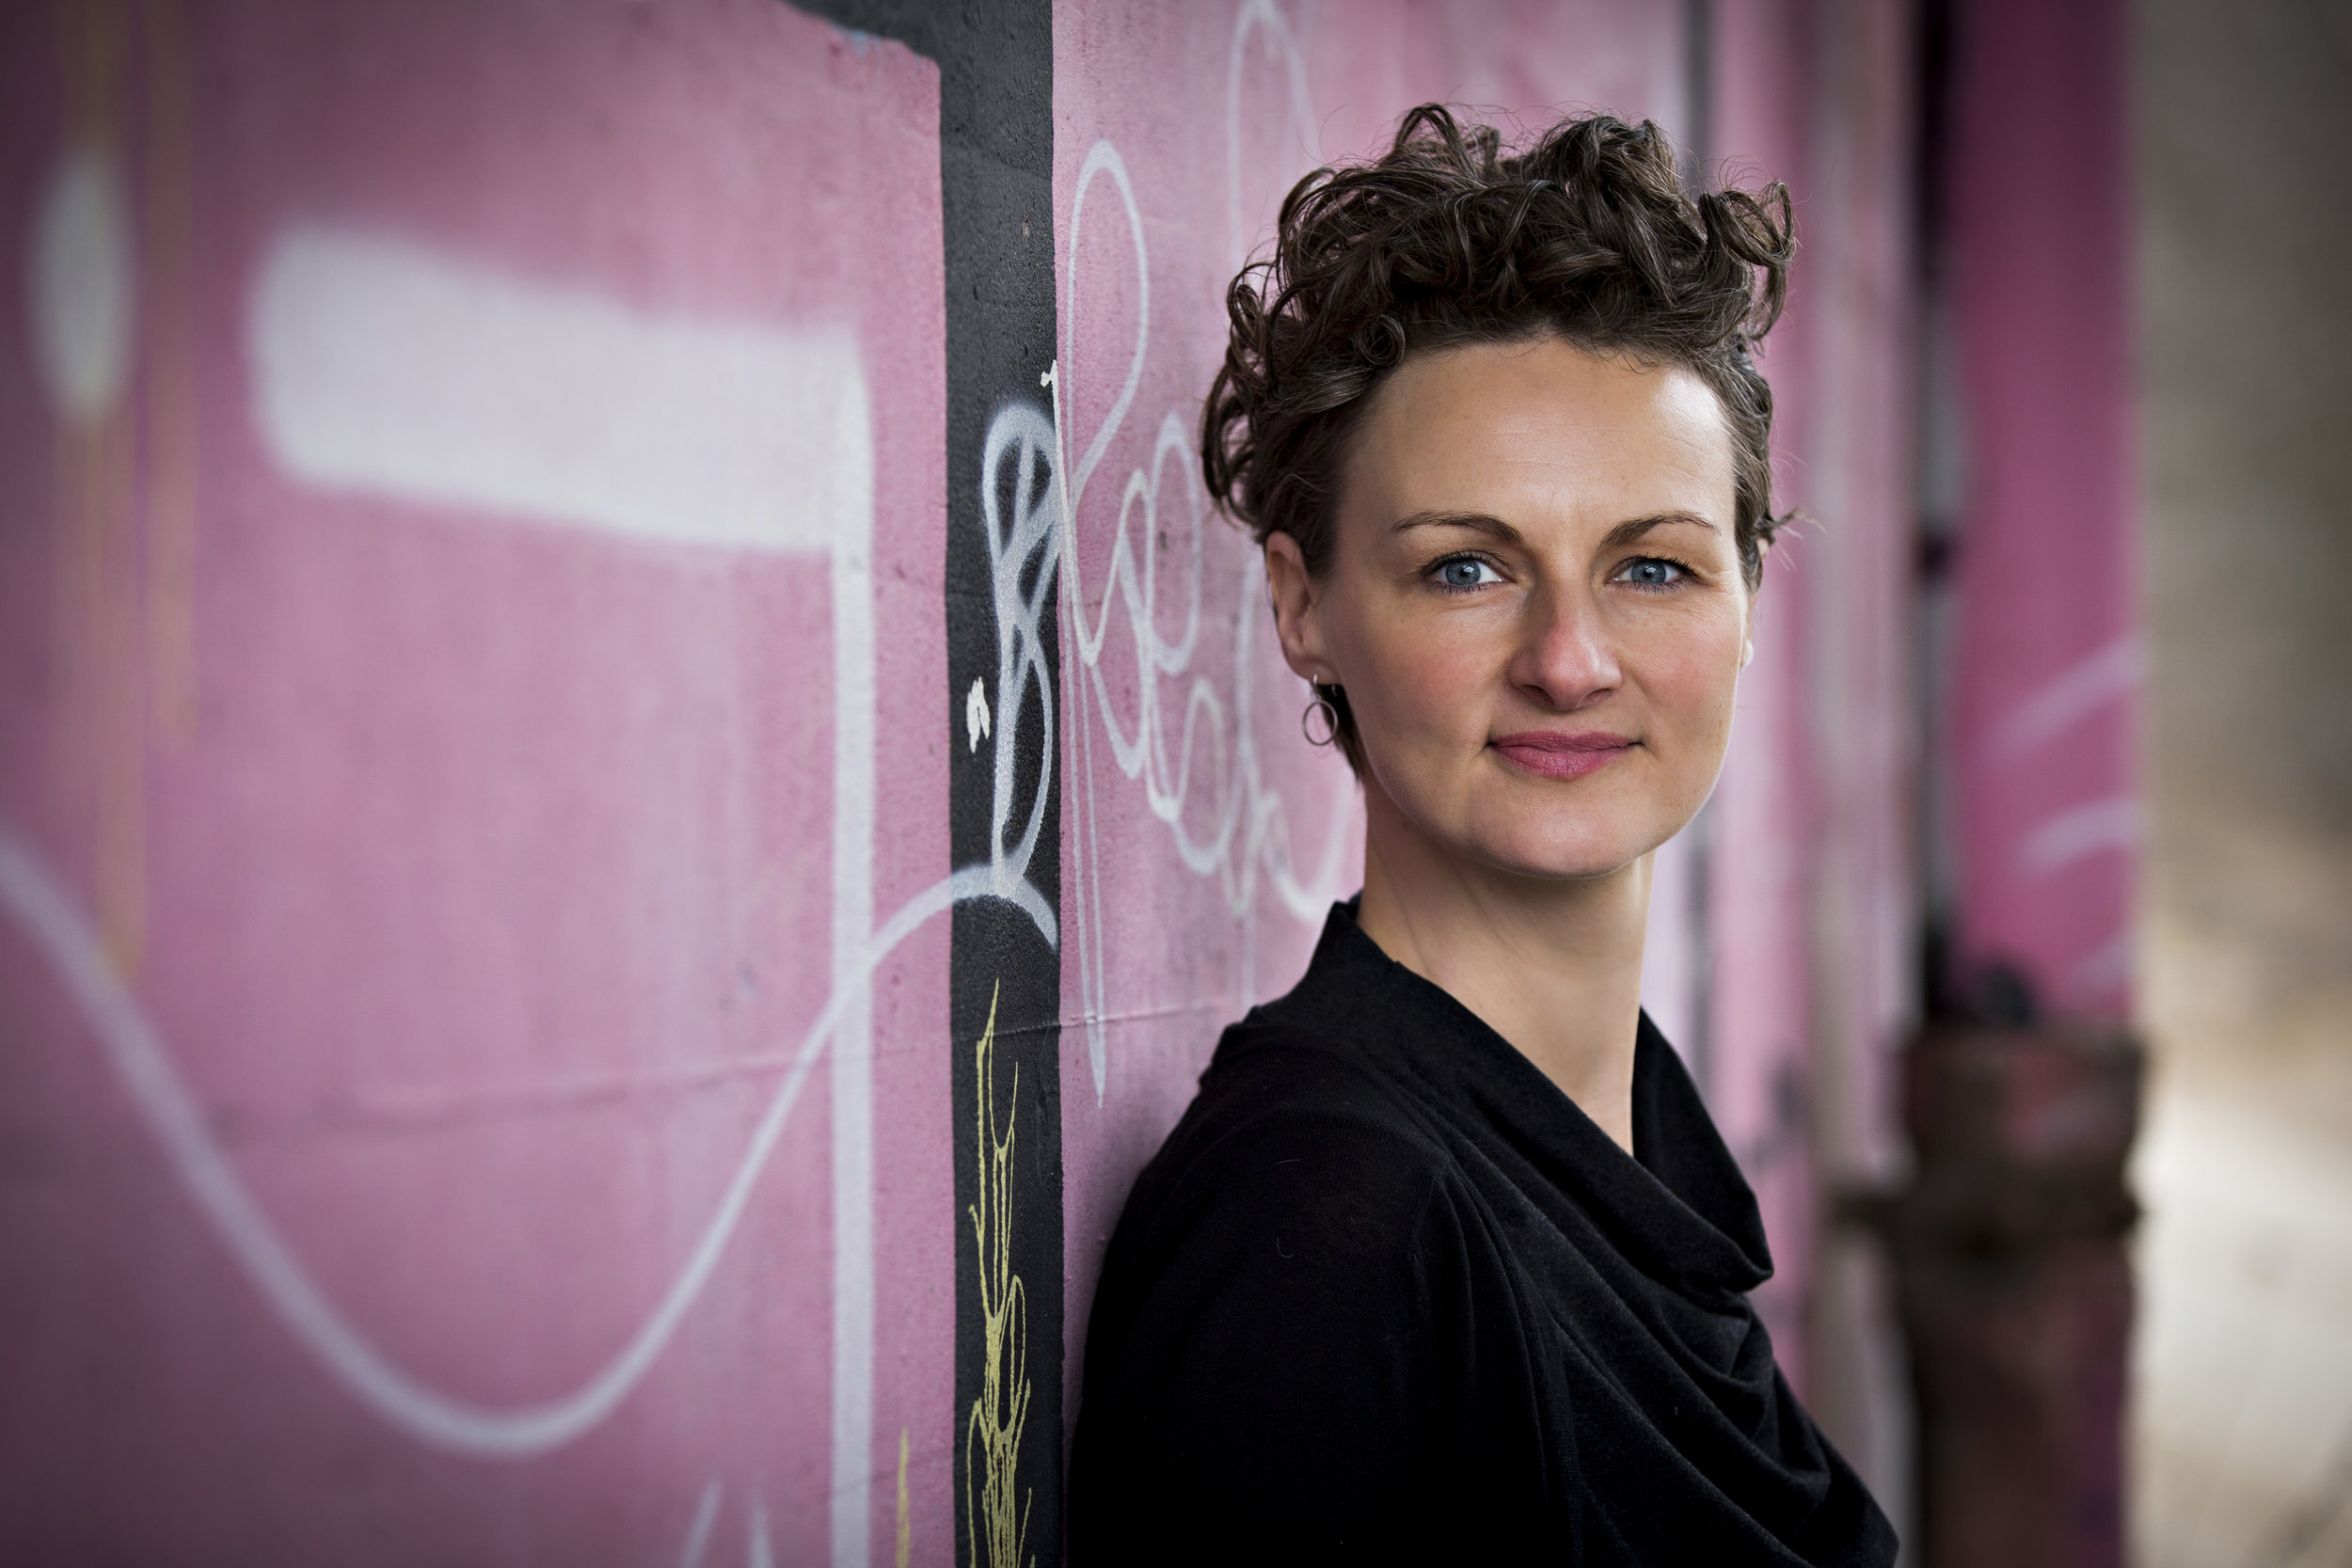 Ny i bestyrelsen - Laura Vilsbaek